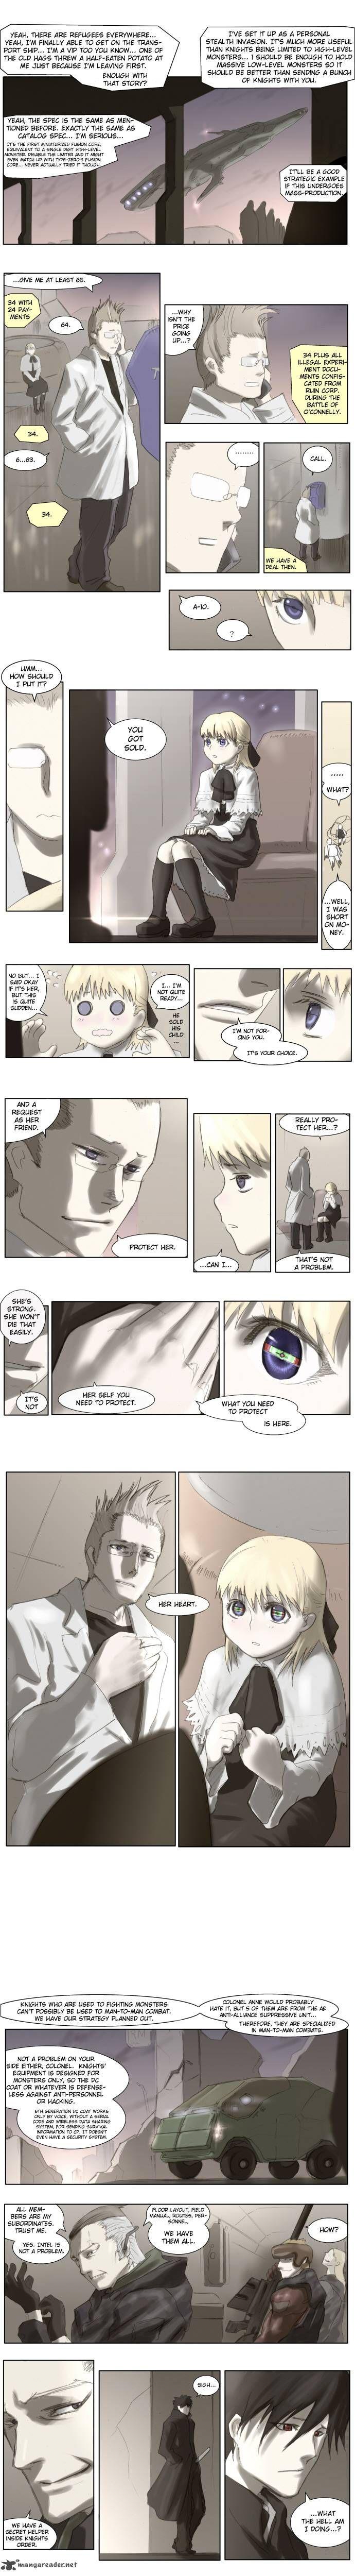 Knight Run 31 Page 2